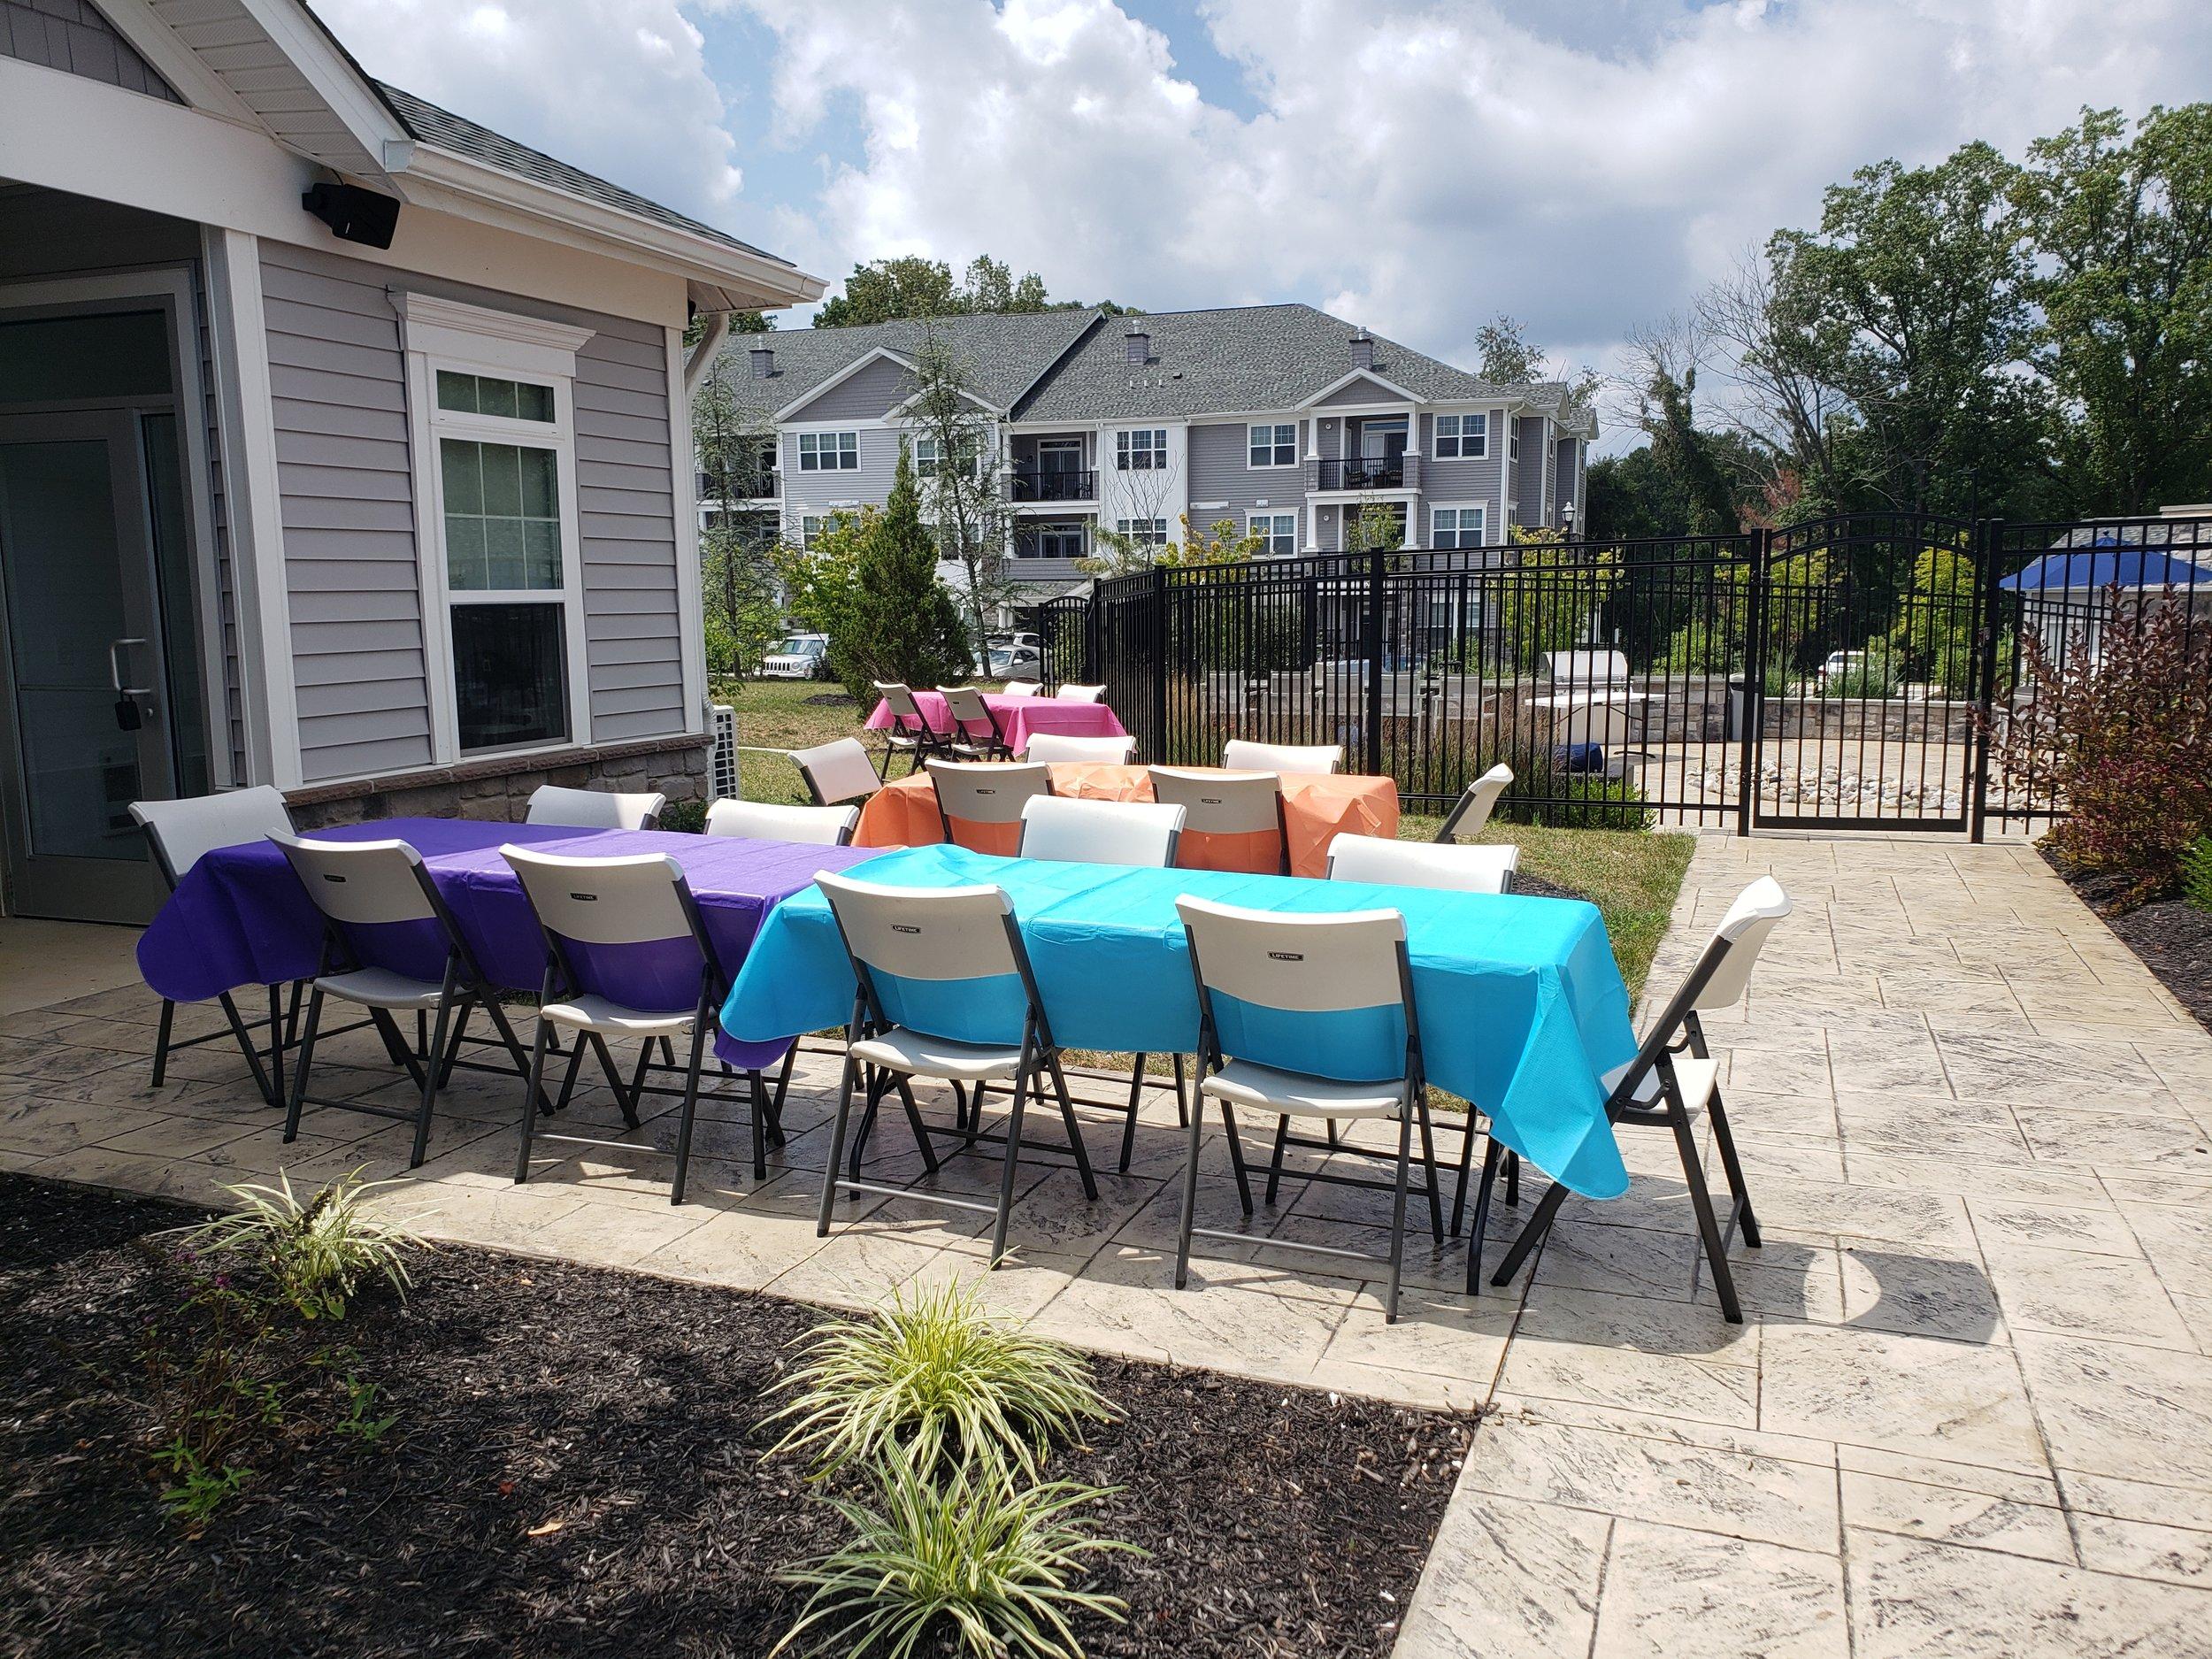 2019 Avanti Apartments Pool Party - Table Decorations